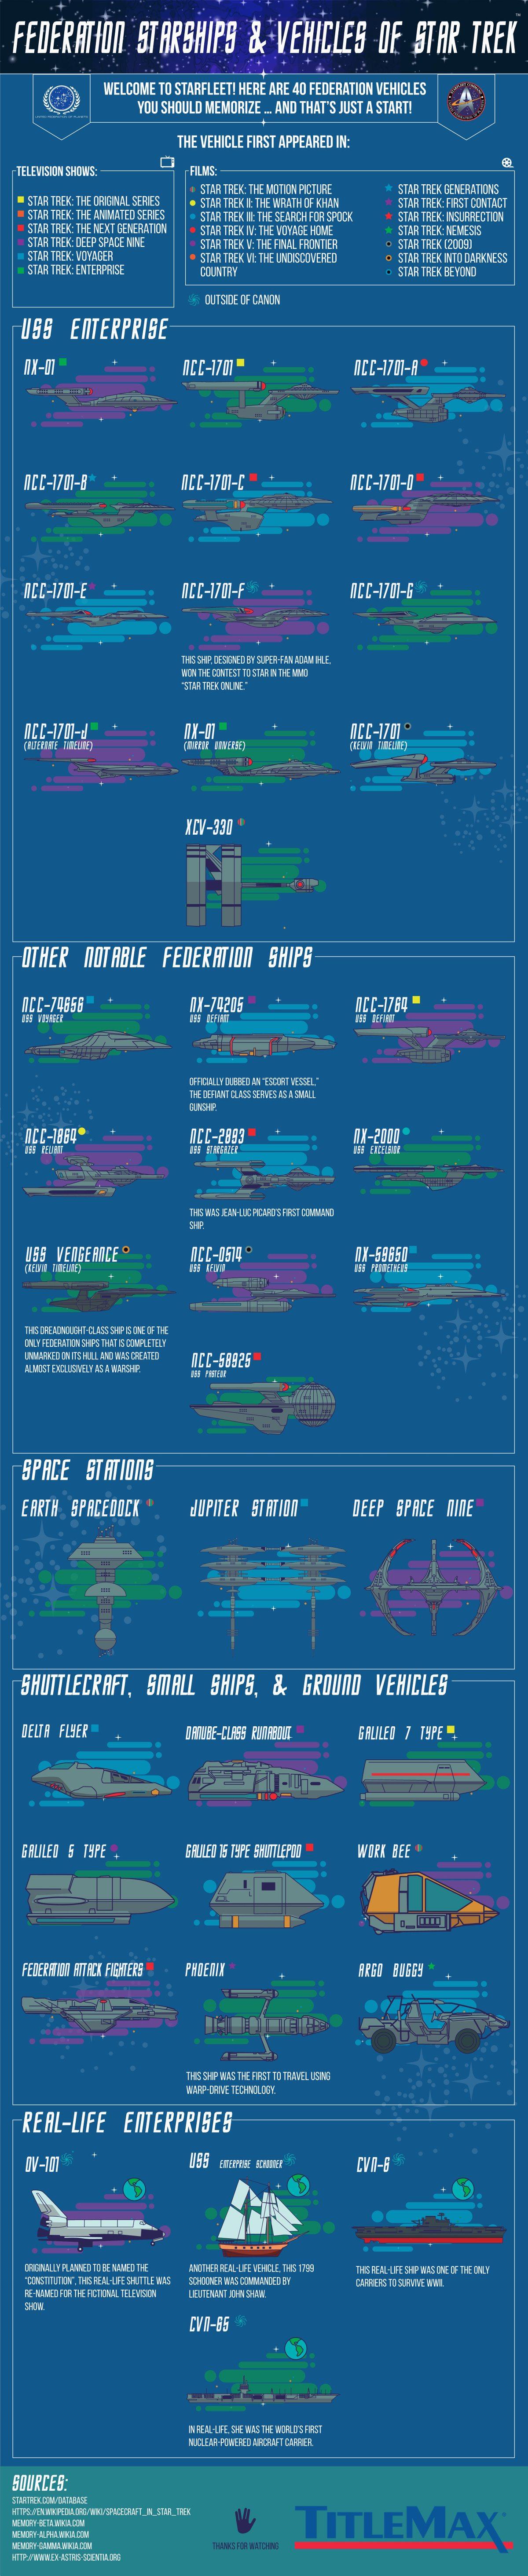 Star Trek Universe Timeline : universe, timeline, Fleet:, Federation, Starships, Allied, Vehicles, Infographic